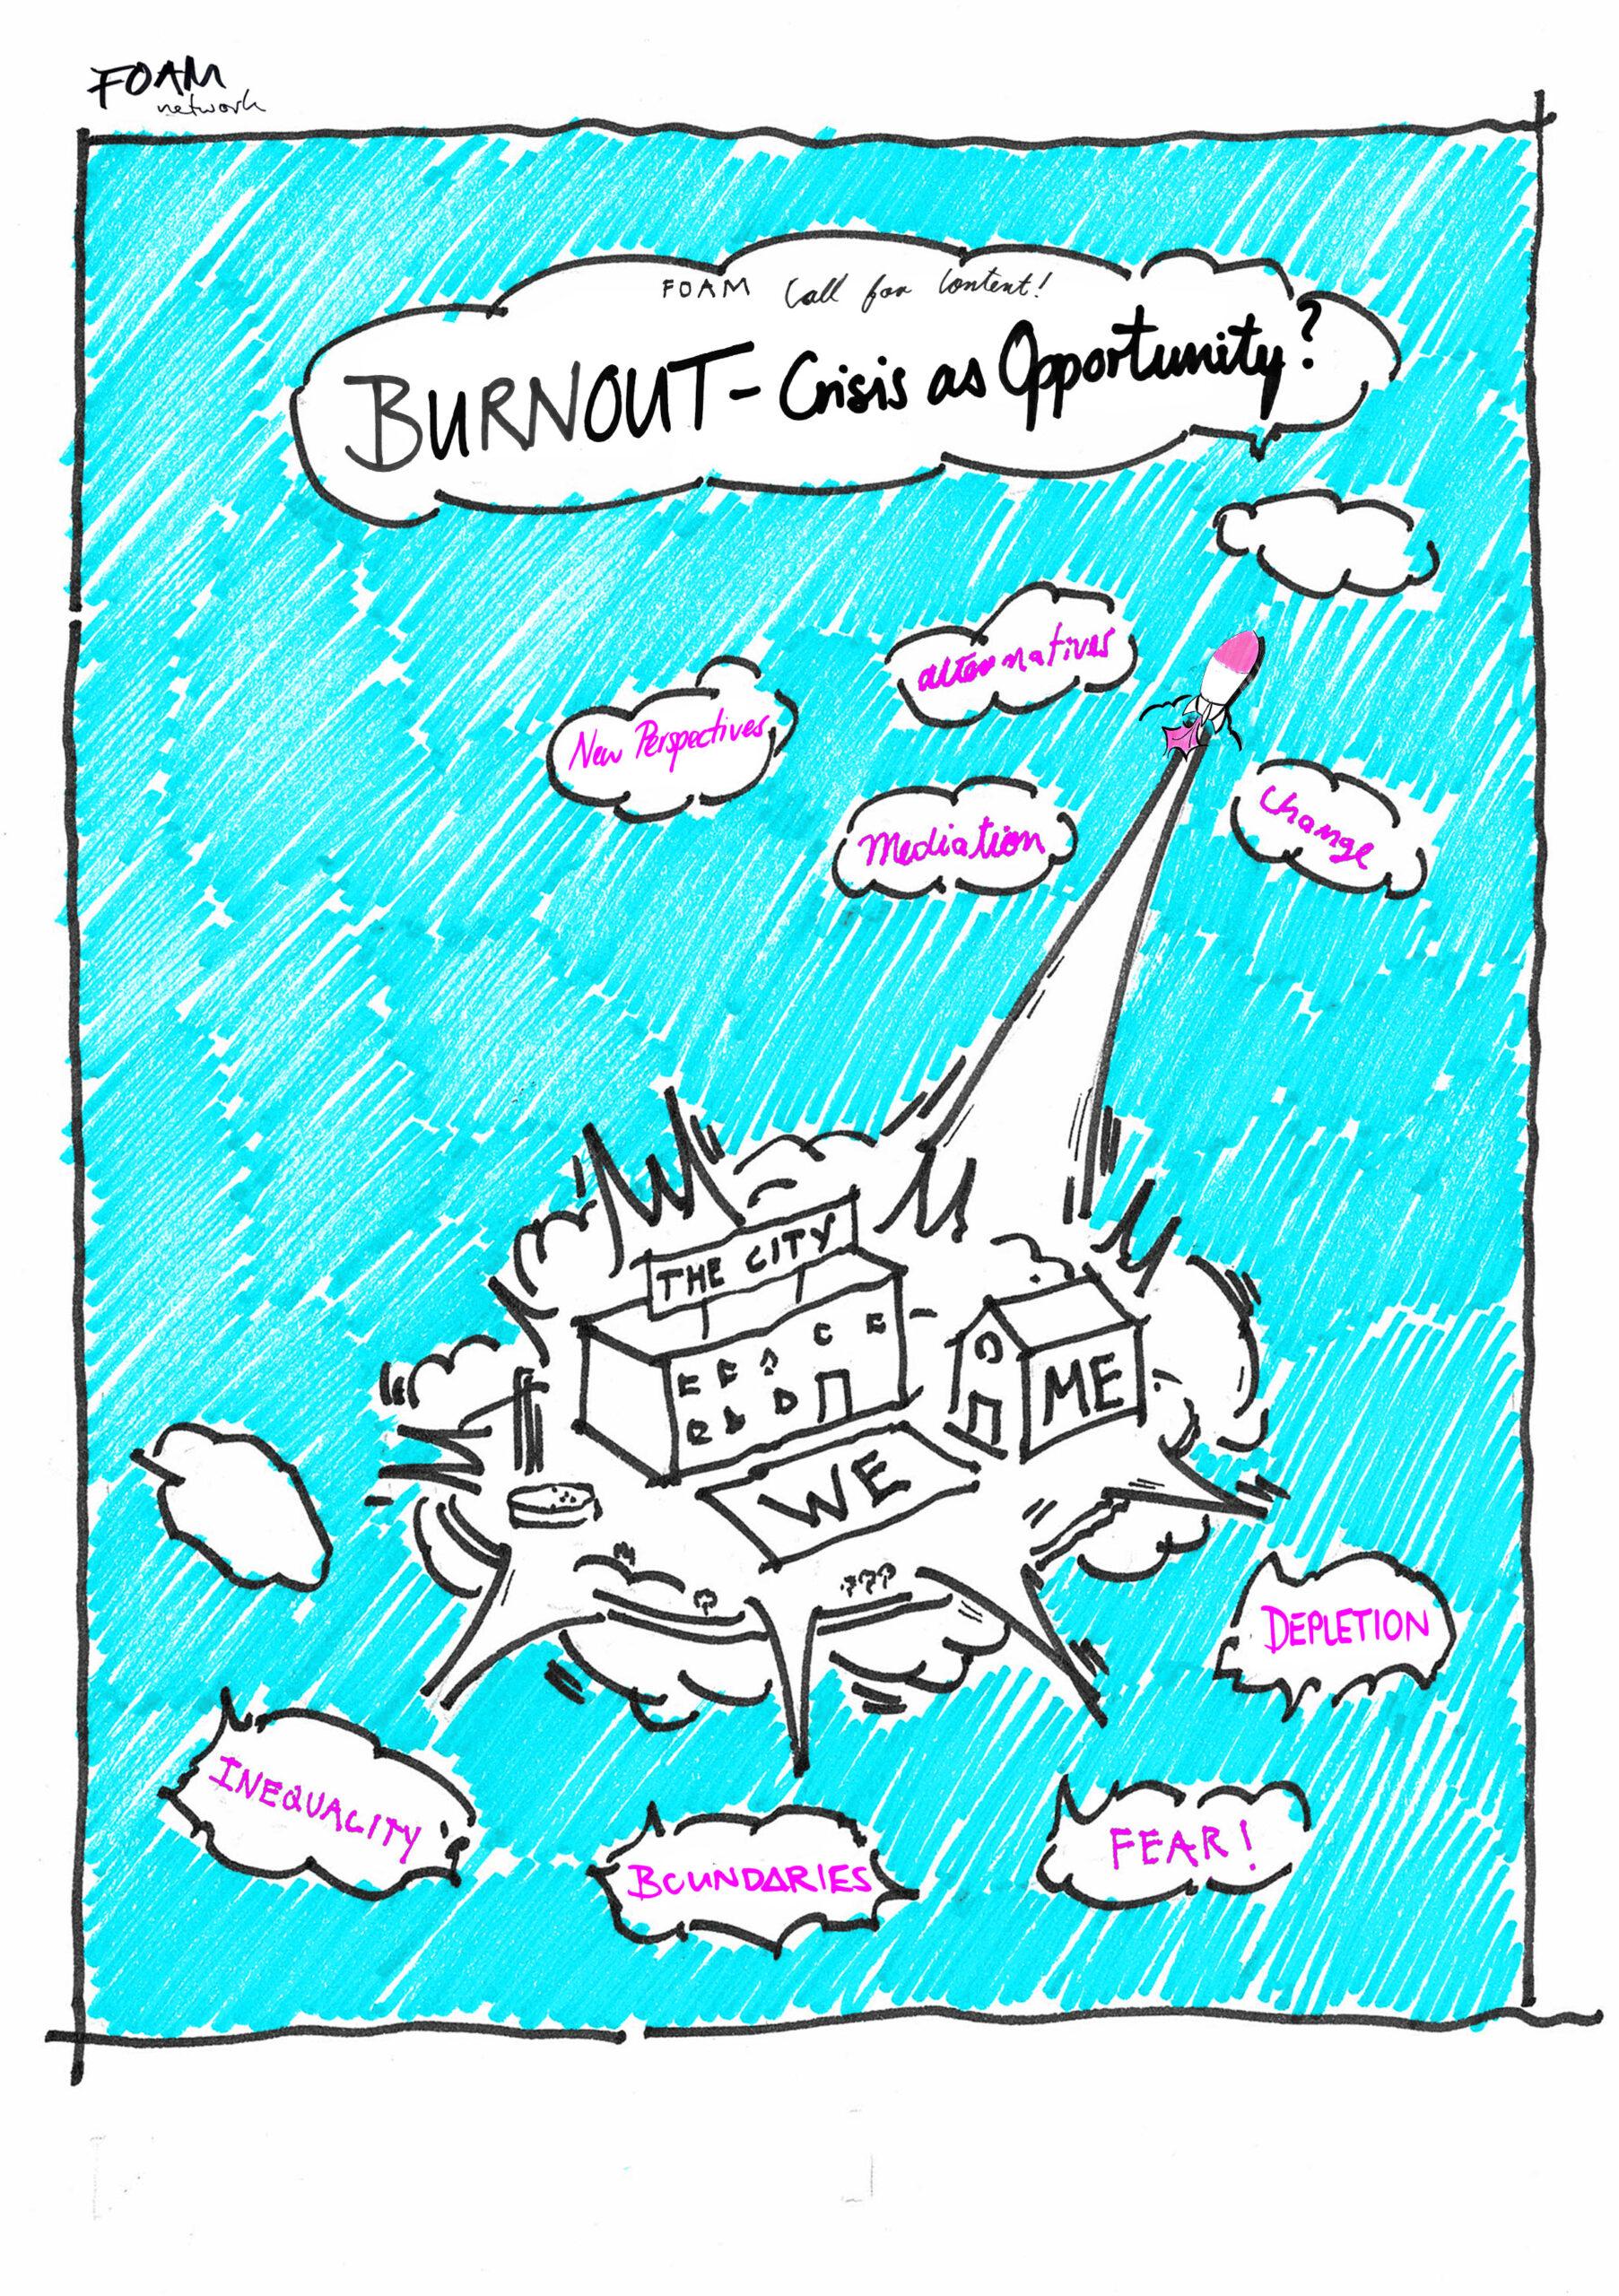 Burnout_Poster_60